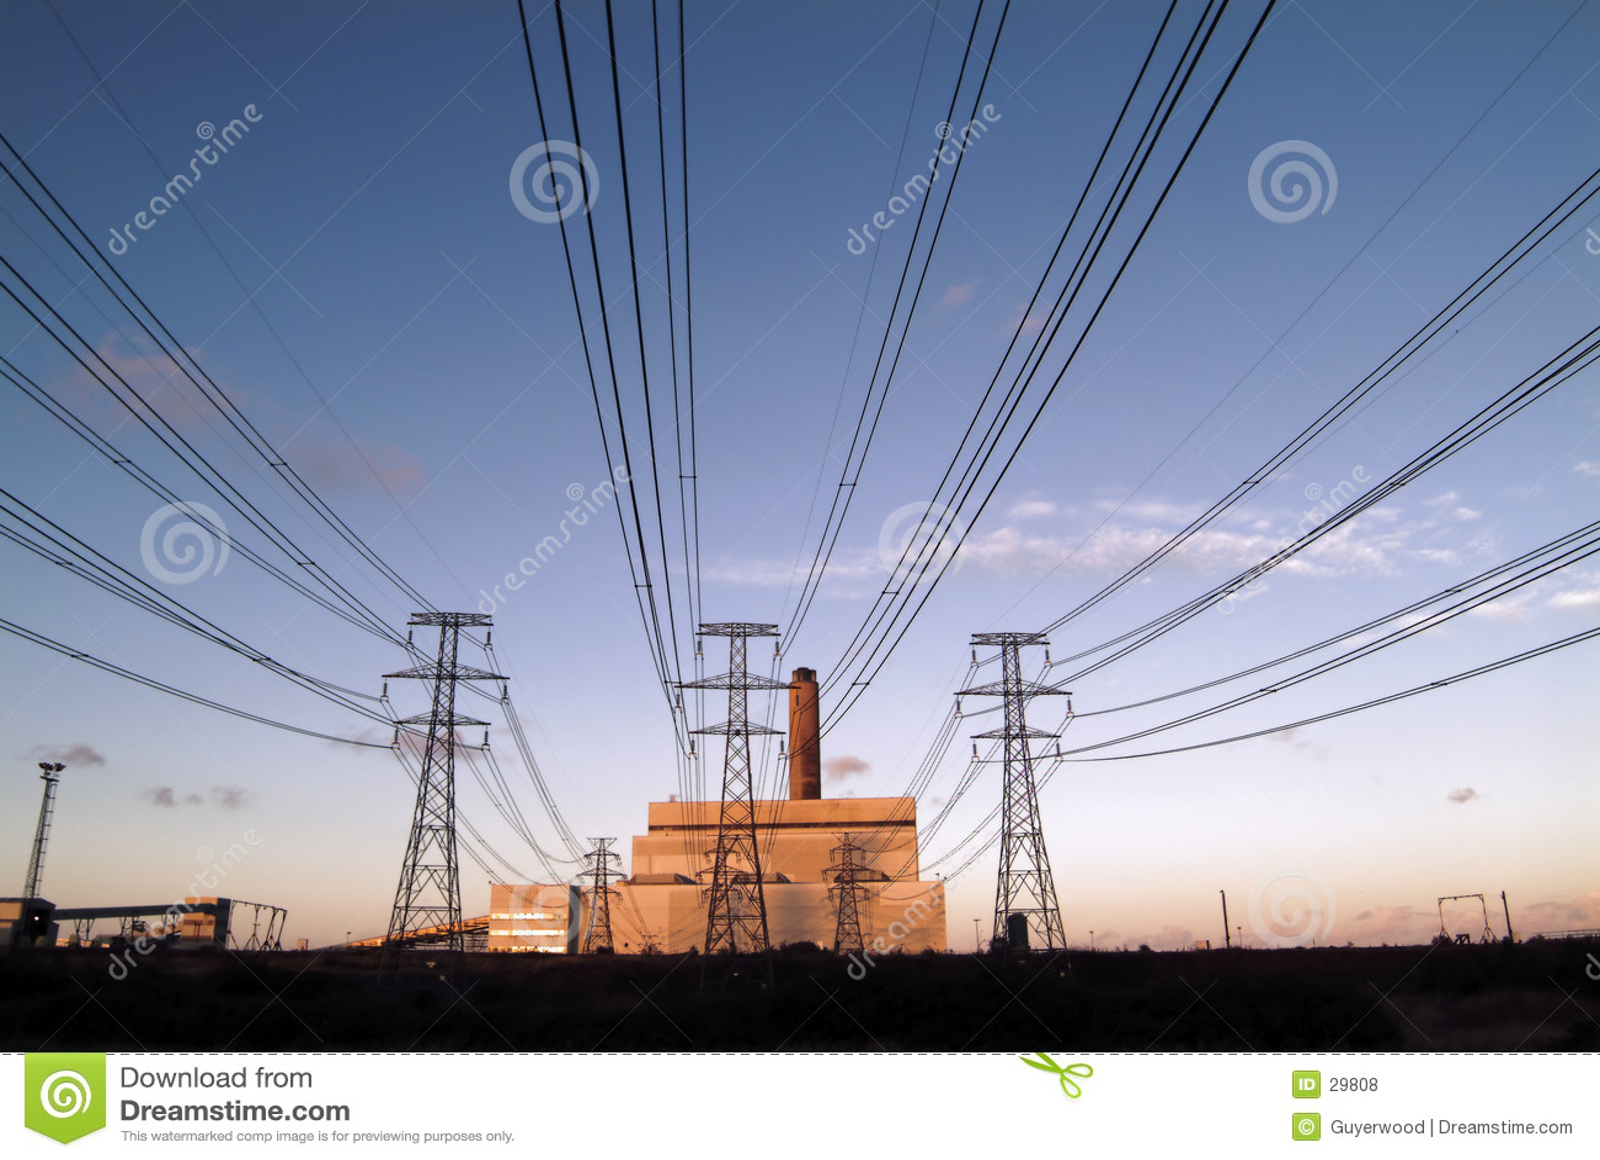 Elektro macht